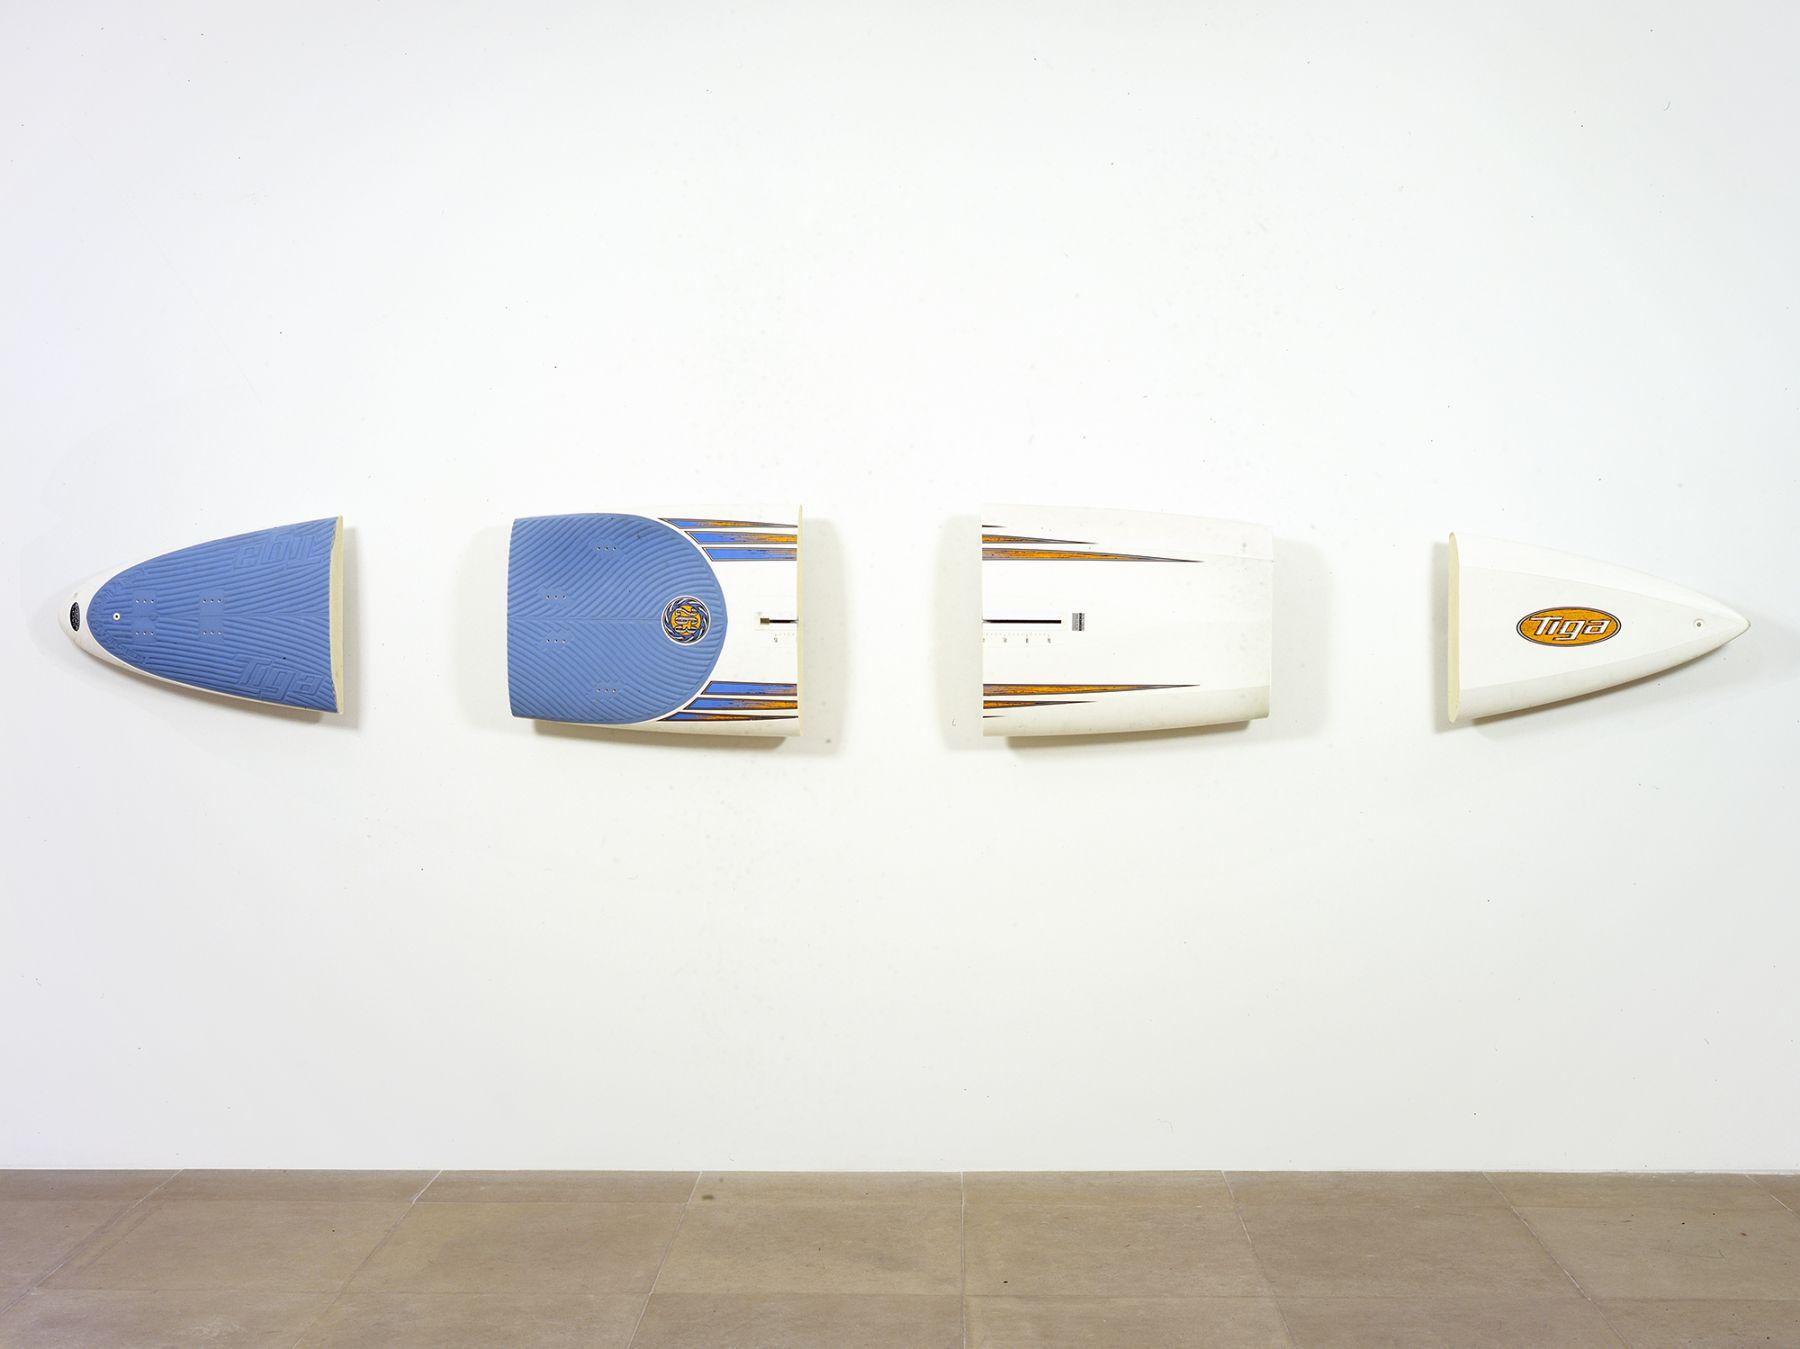 Michael Krebber, Tiga, 2008, Windsurfing board, wall mounts, 21 x 153 inches